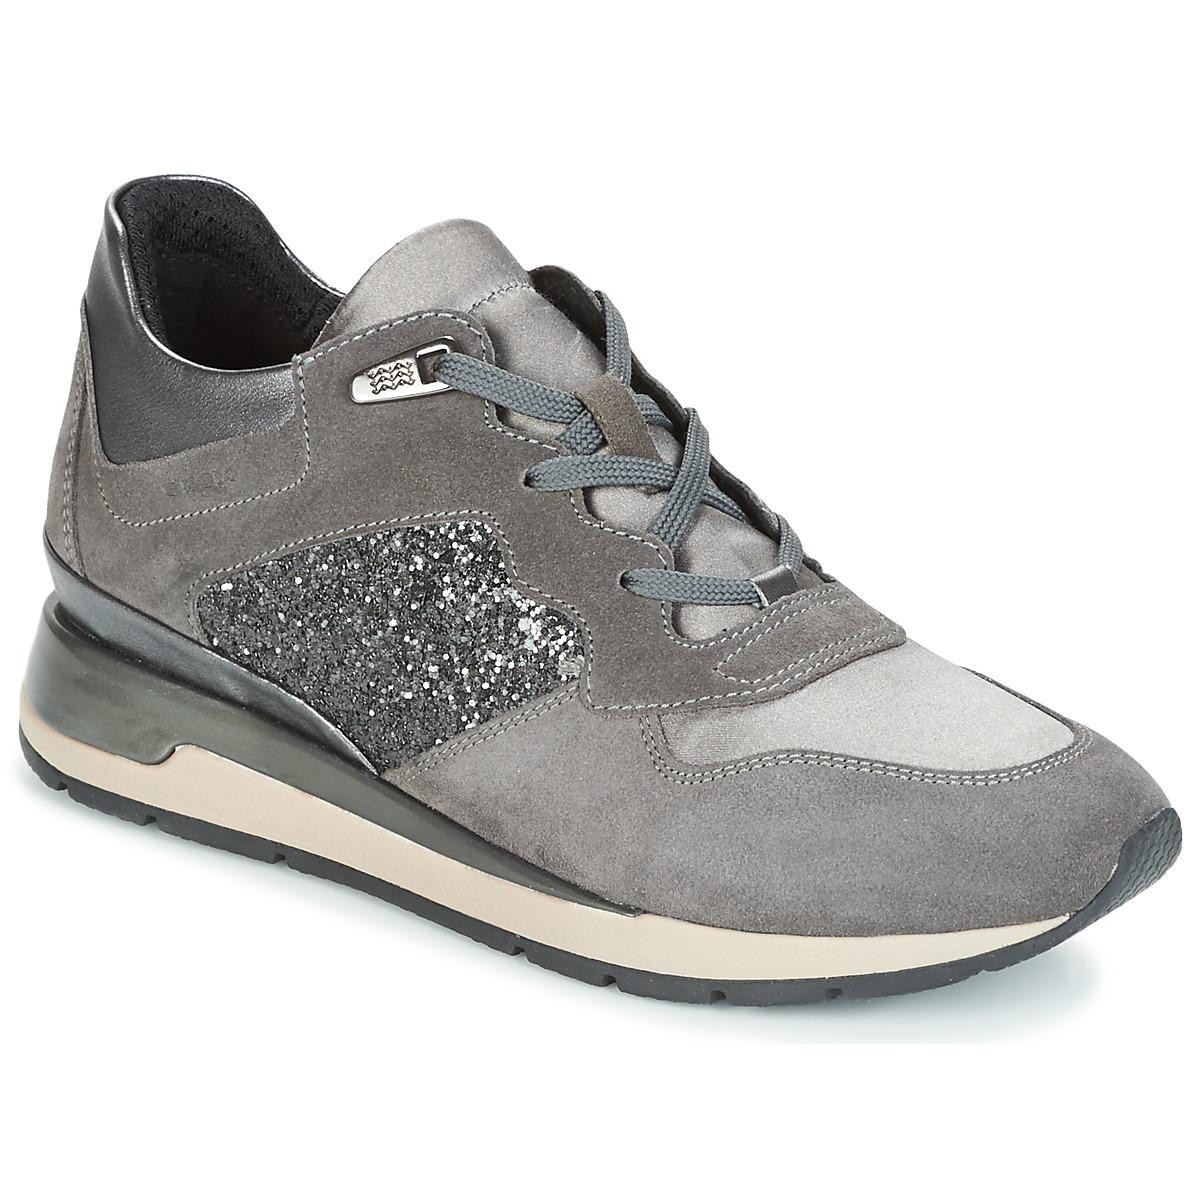 Geox D SHAHIRA Grau - Kostenloser Versand bei Spartoode ! - Schuhe Sneaker Low Damen 95,20 €